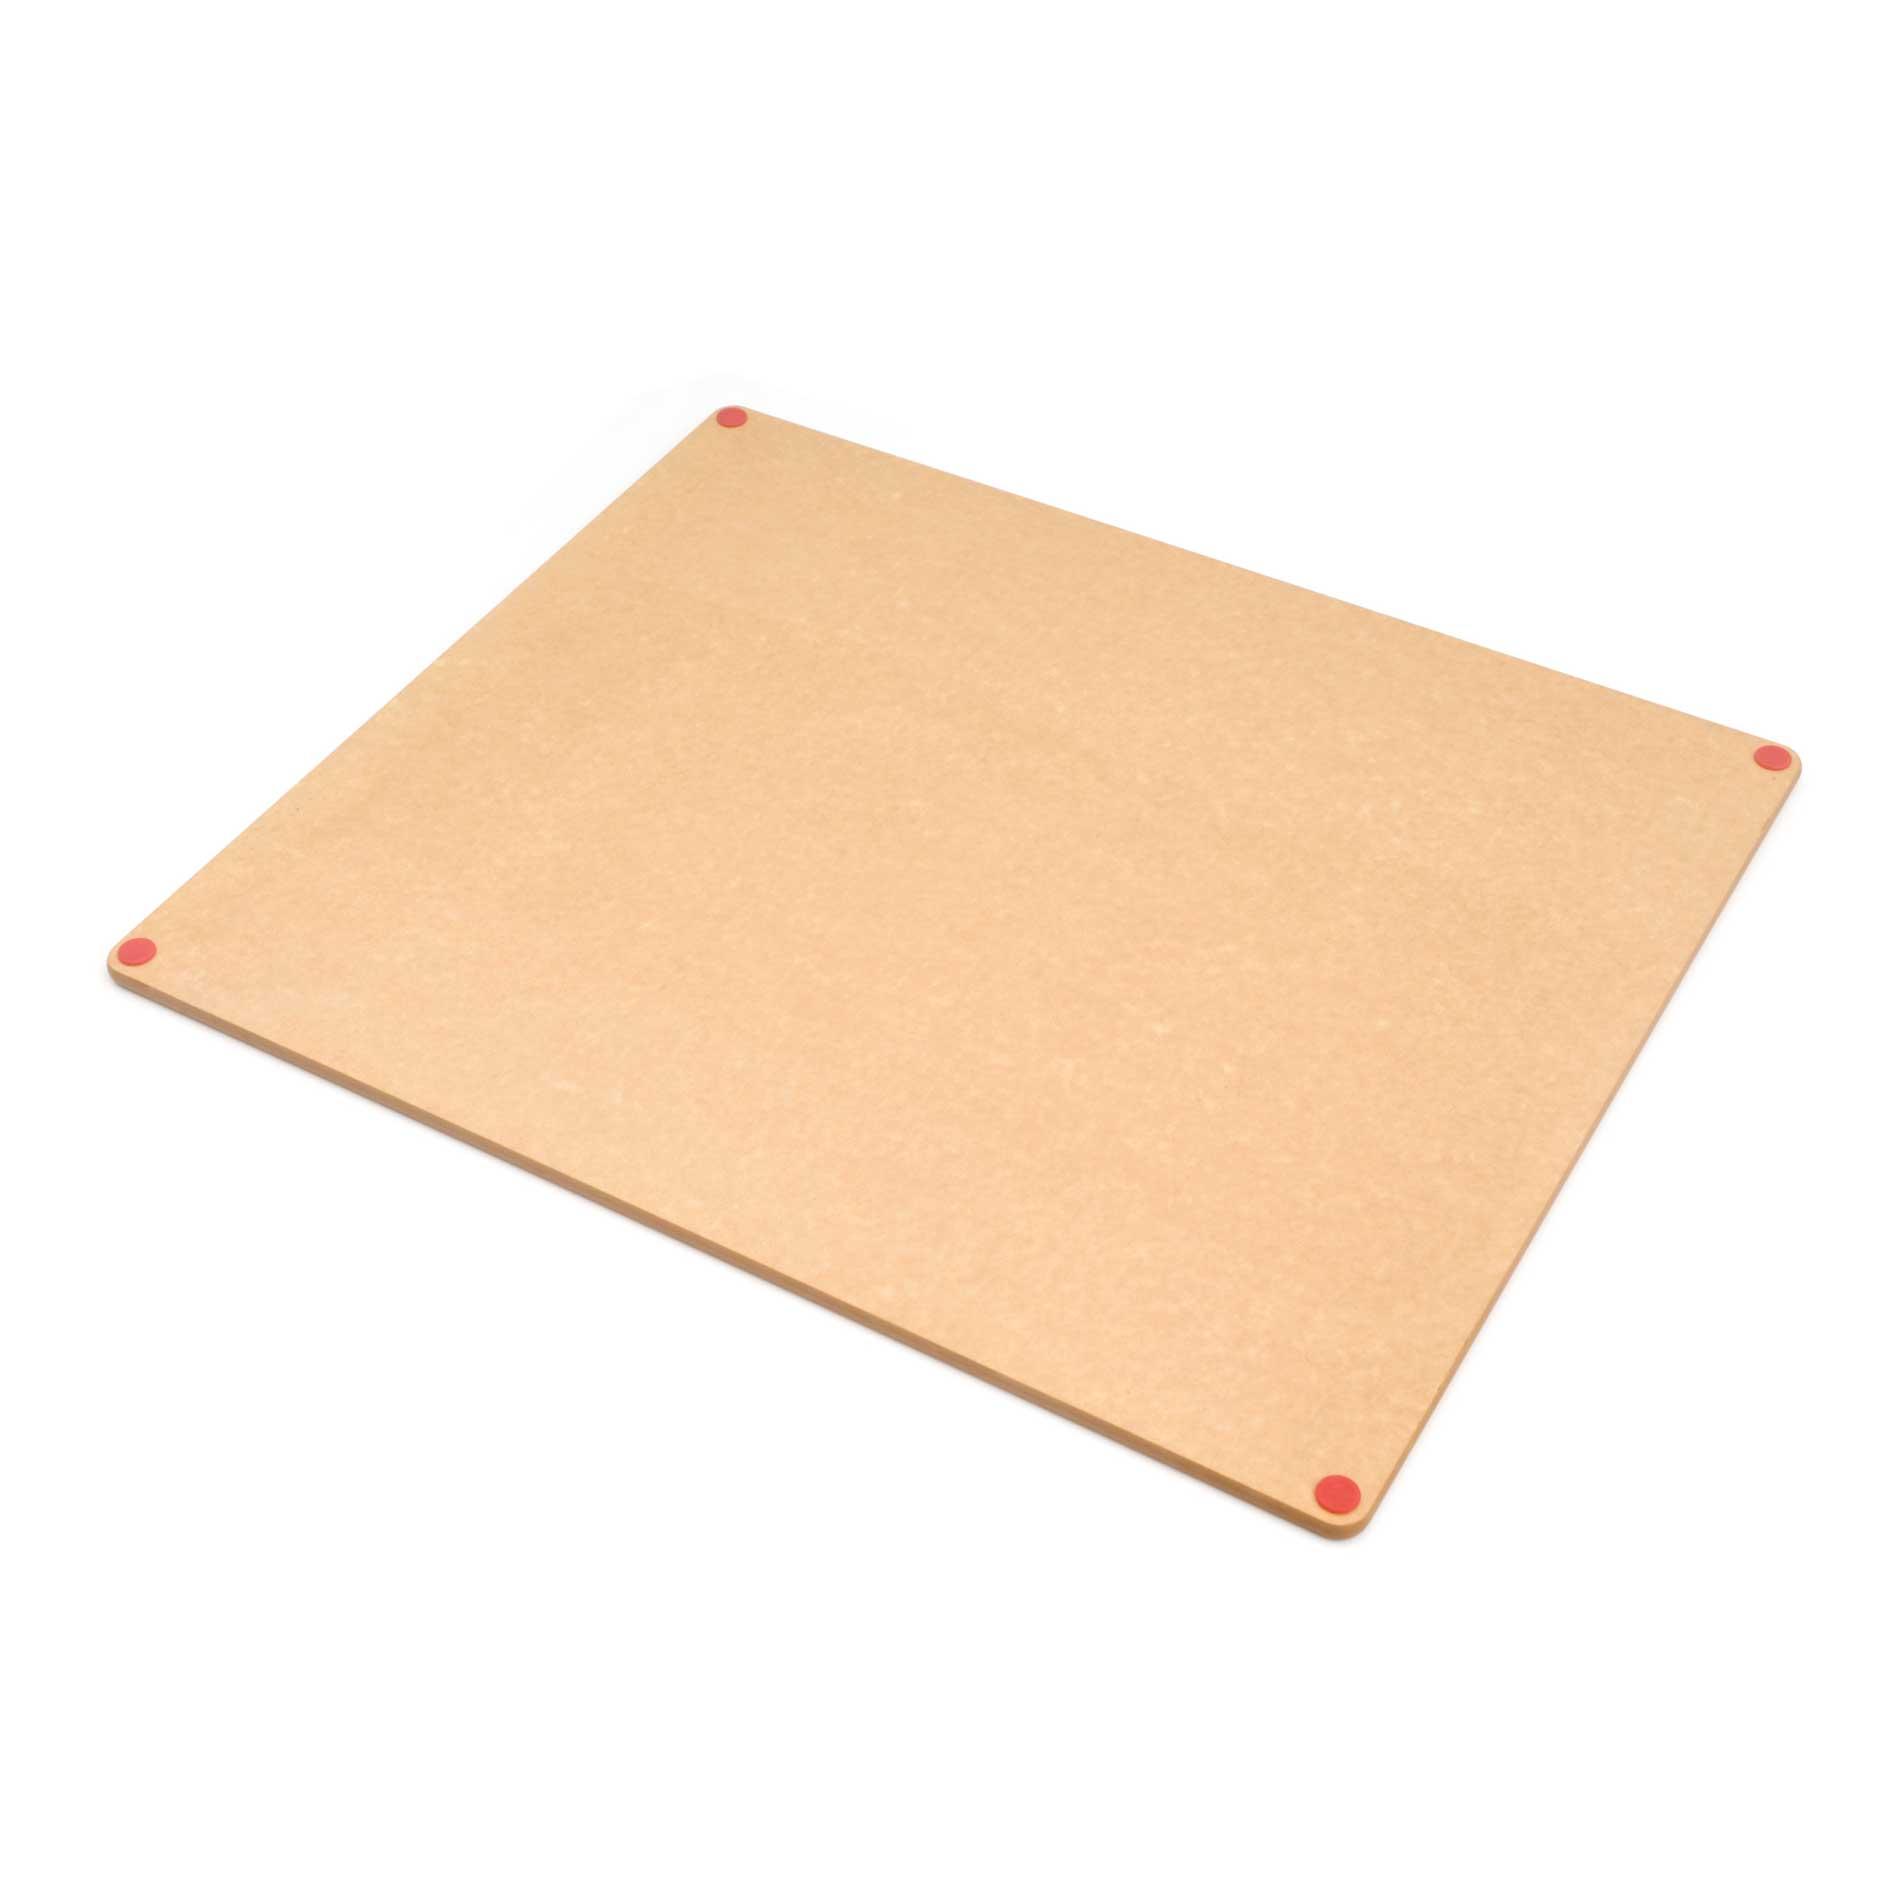 Victorinox Swiss Army 622-23190108 cutting board, wood